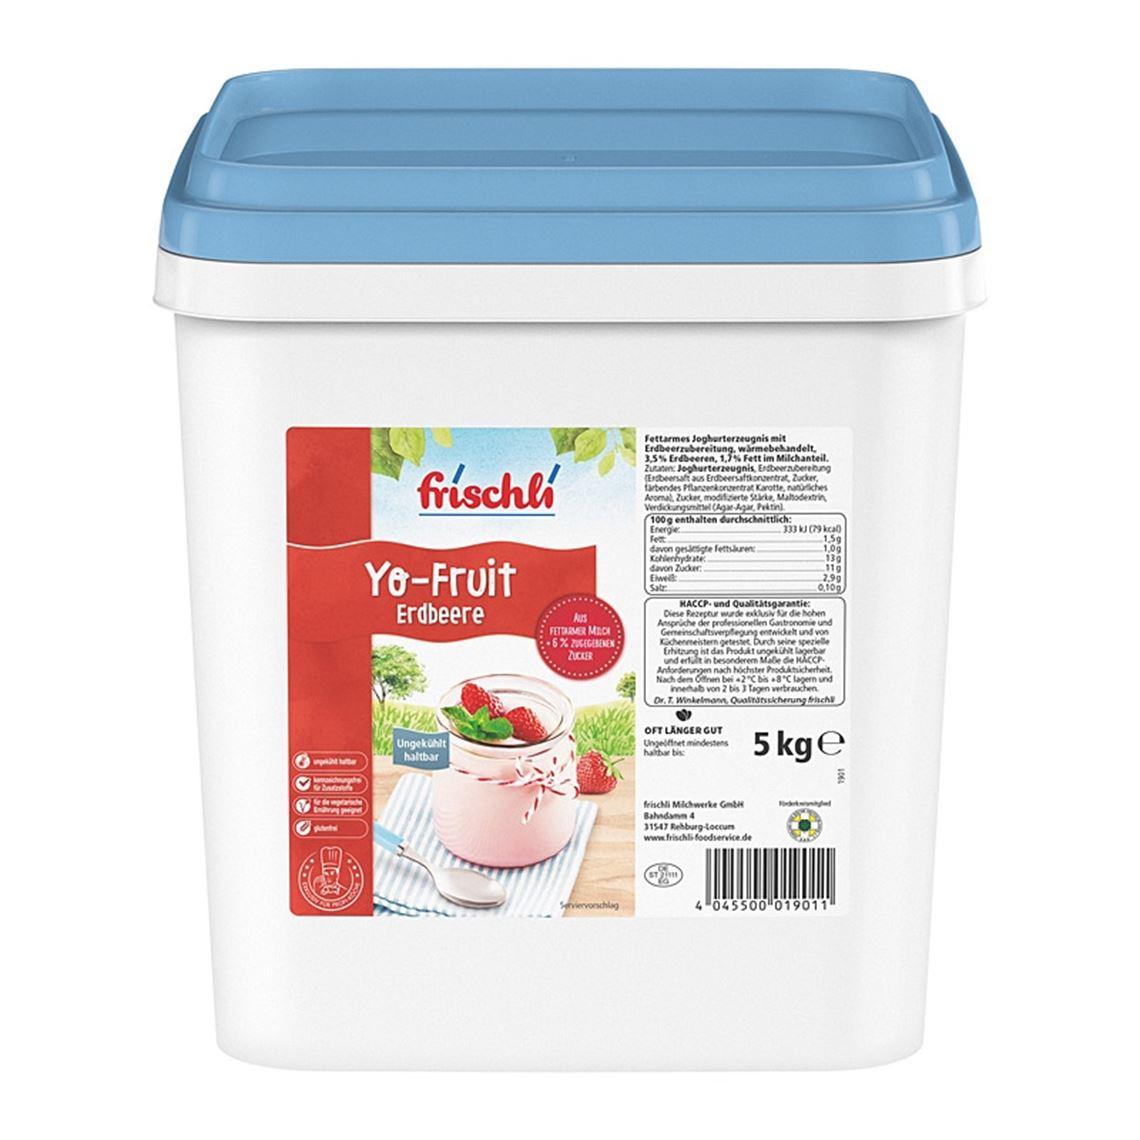 Frischli Yo-Fruit Erdbeer 5kg